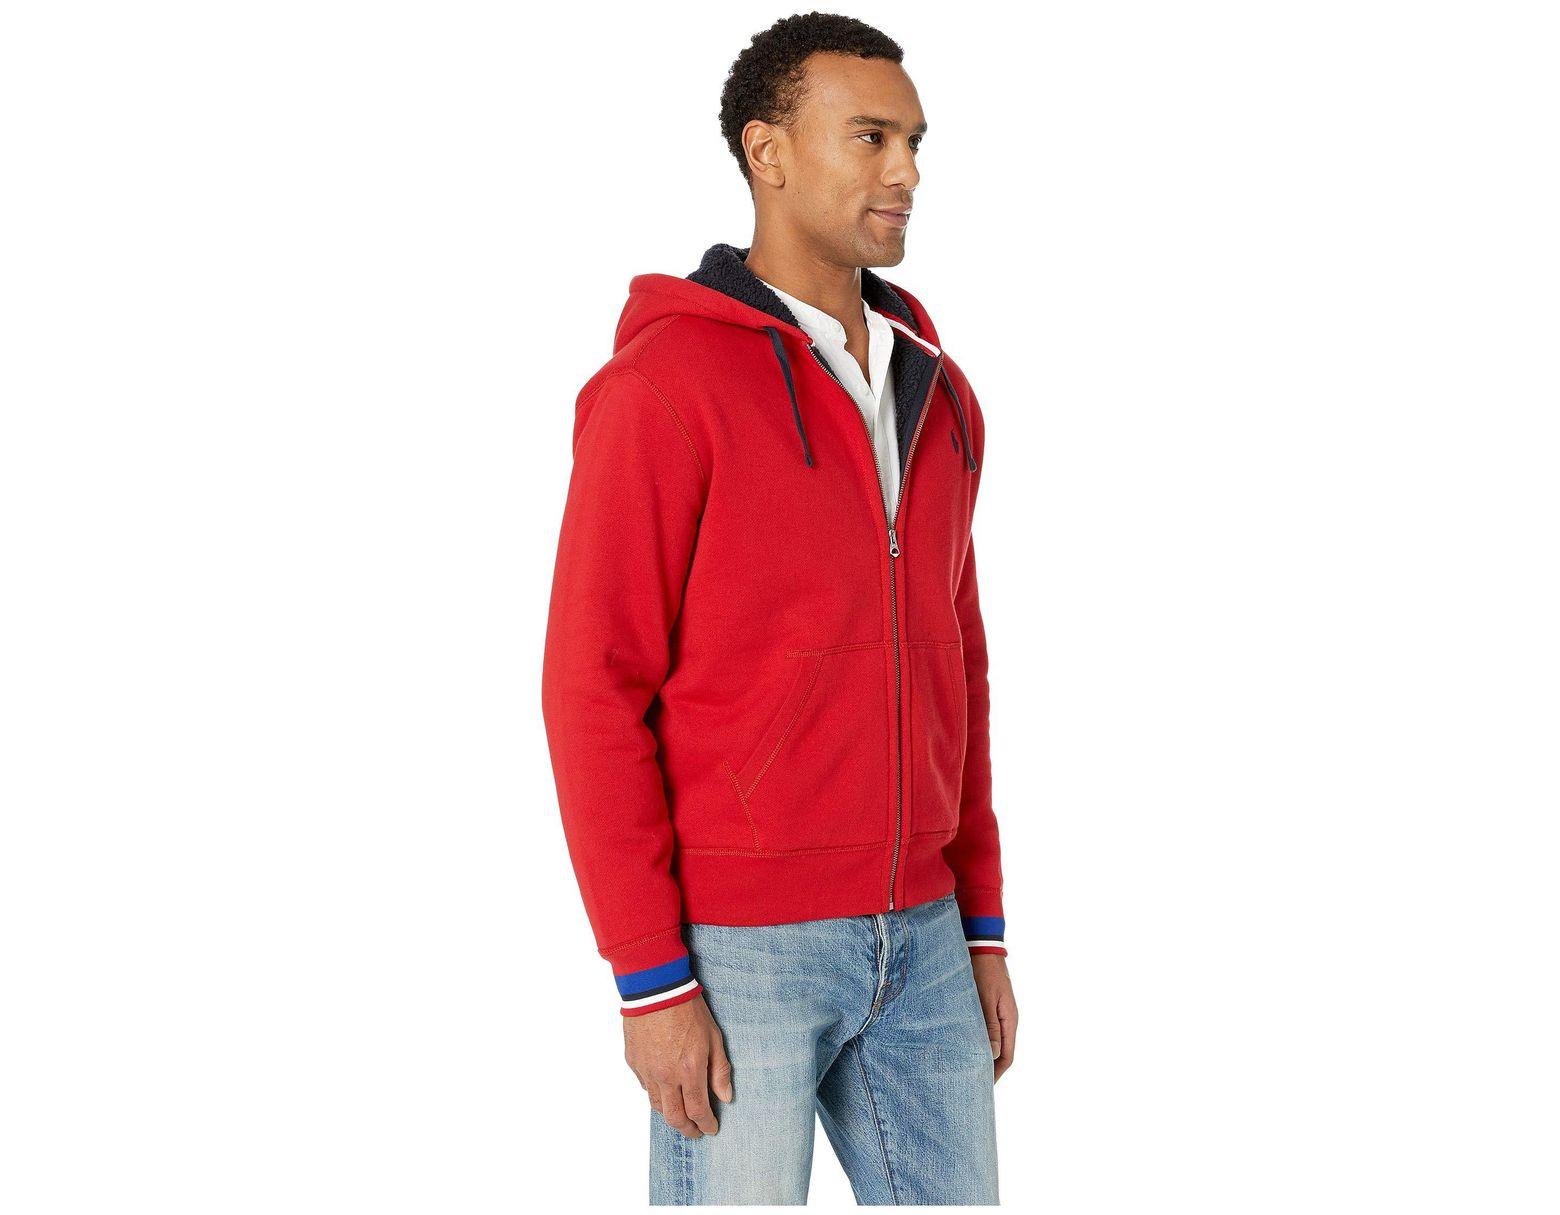 1b6b45cd8 Polo Ralph Lauren Sherpa Fleece Full Zip (aviator Navy) Men s Clothing in  Red for Men - Lyst